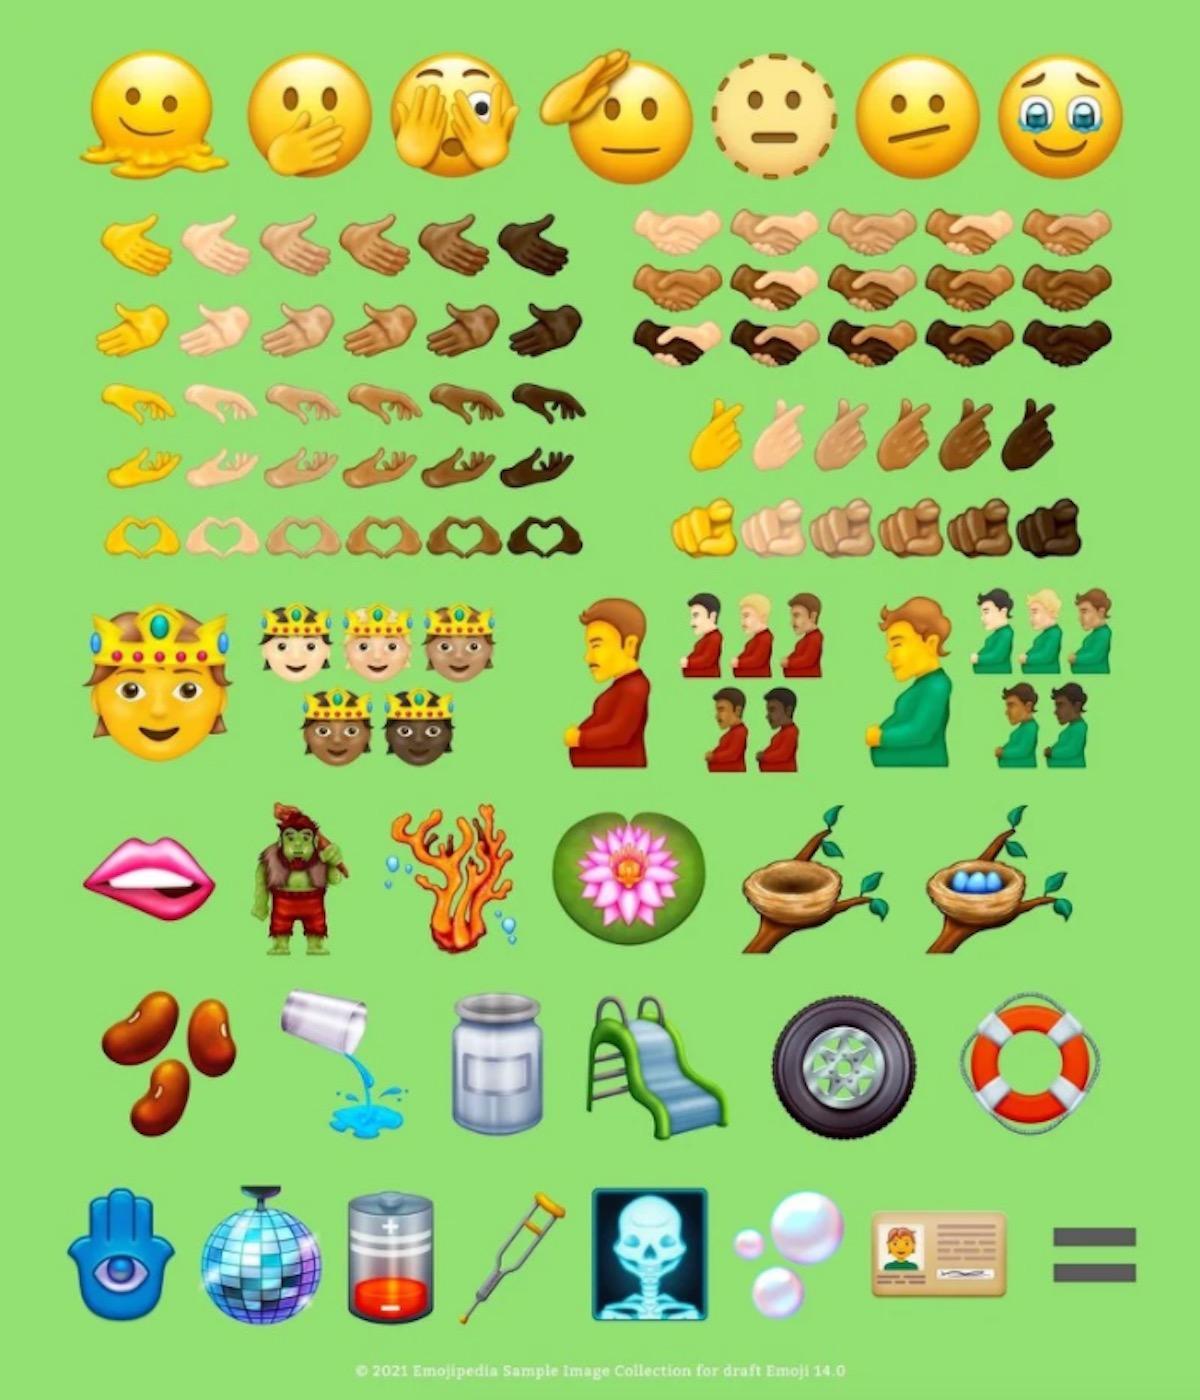 Ecco le nuove emoji Unicode 14 candidate per iPhone